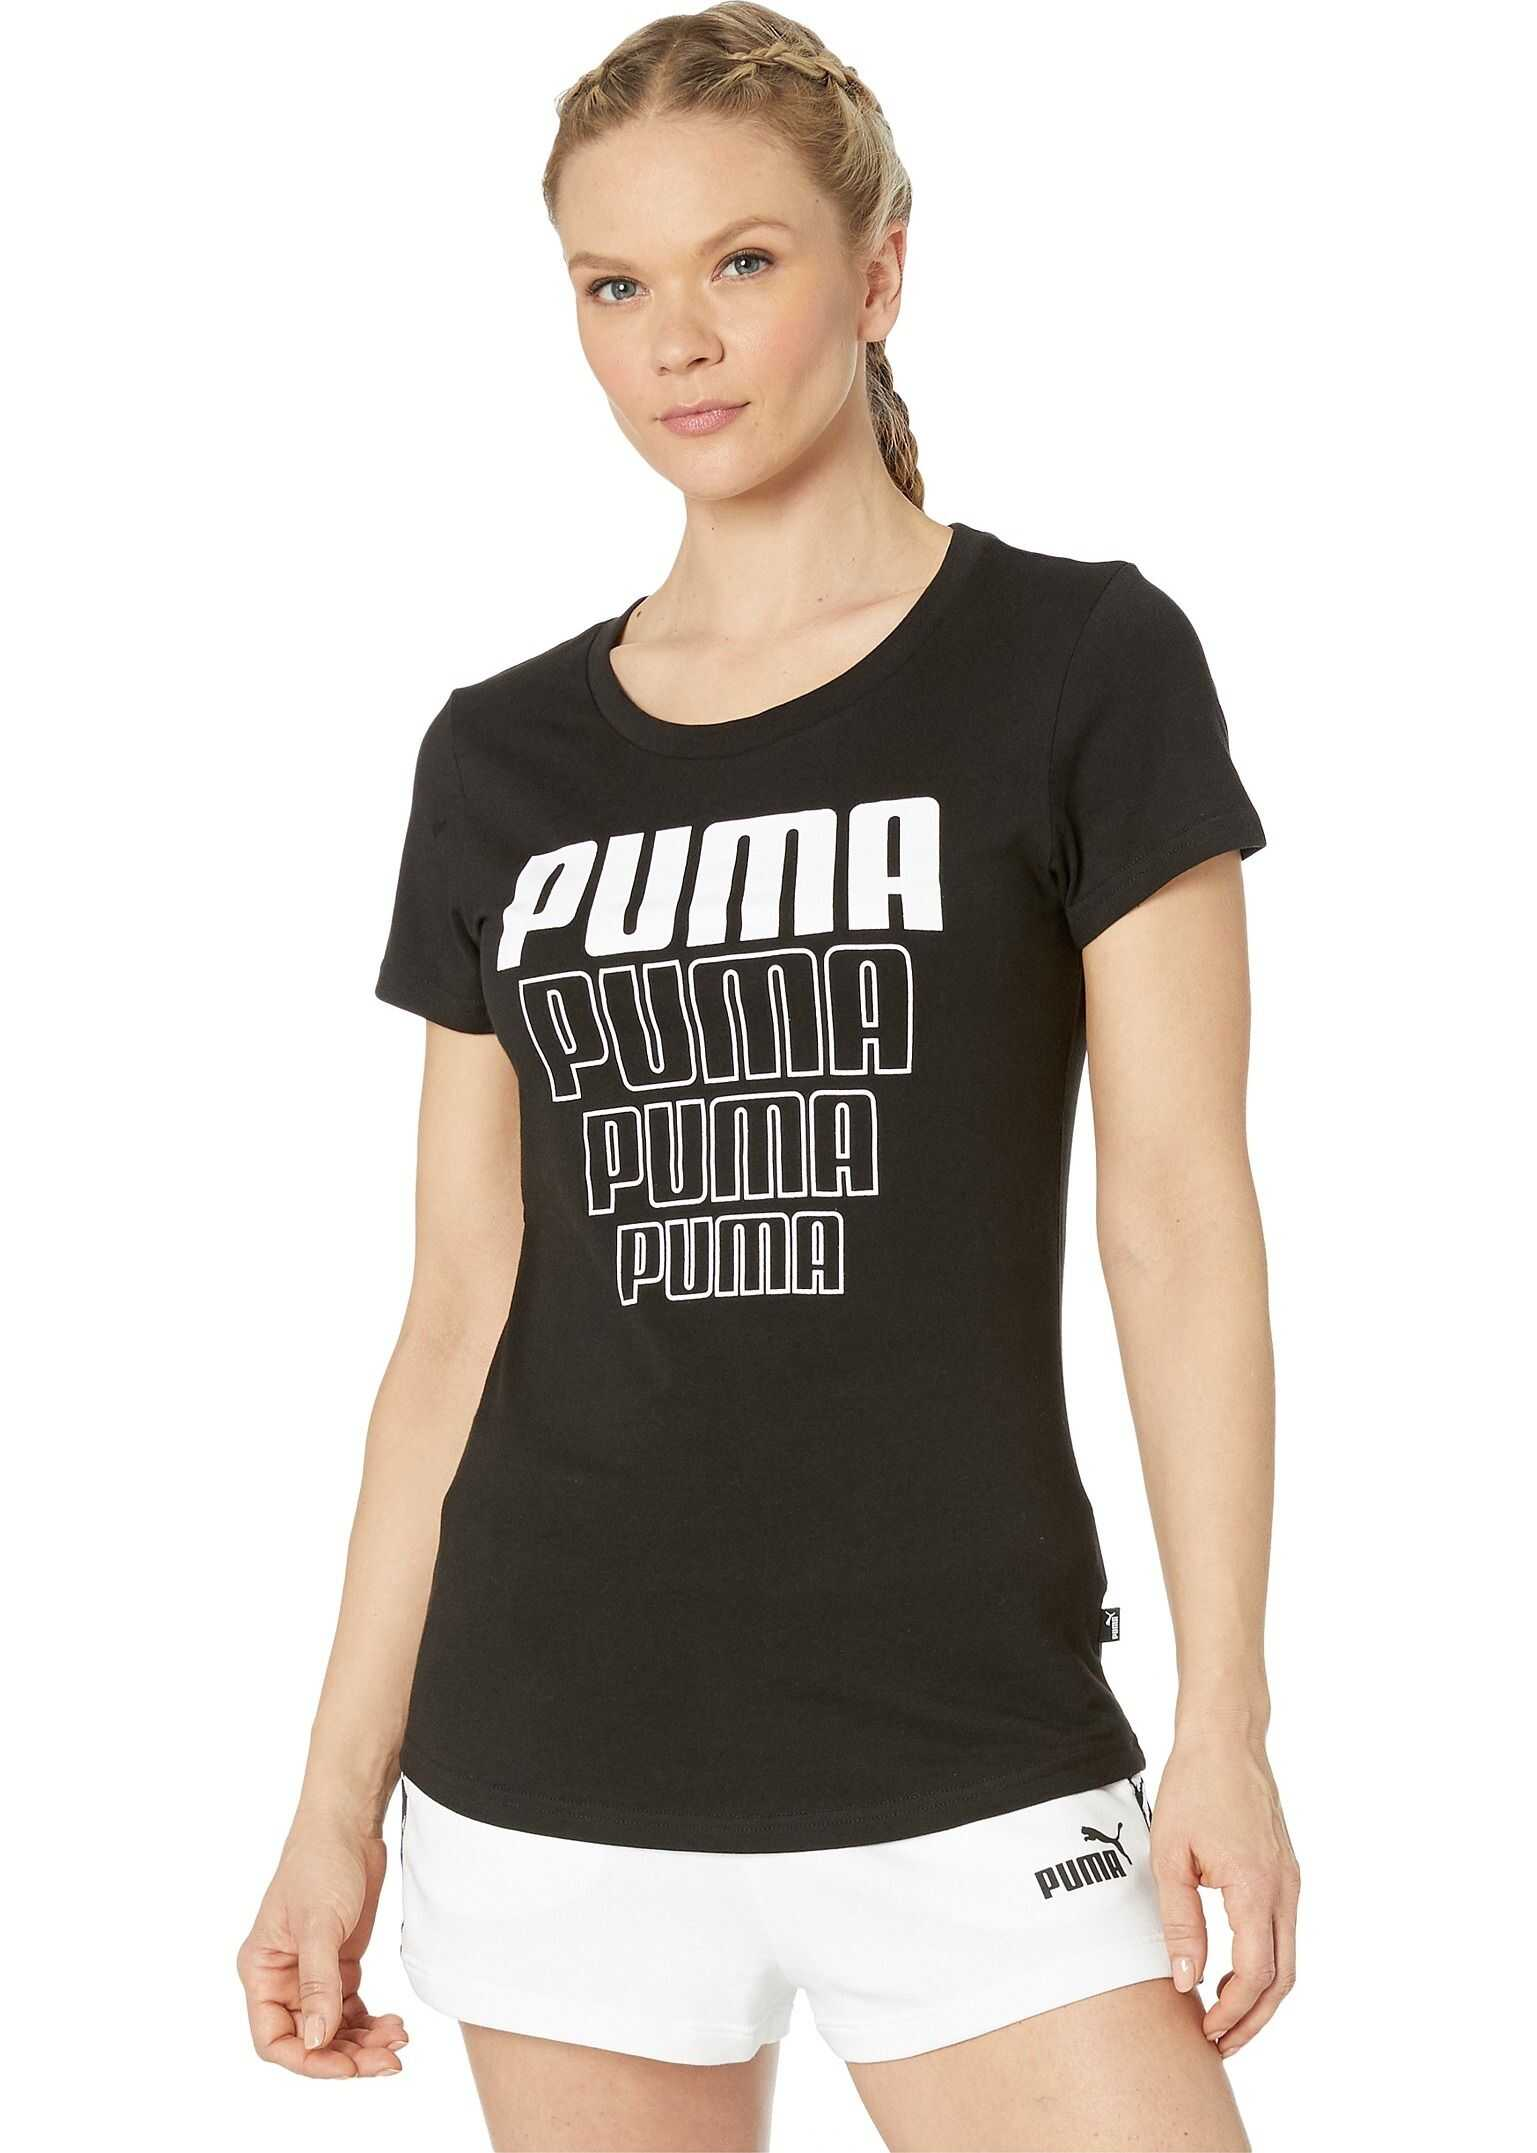 PUMA Rebel Graphic Tee PUMA Black